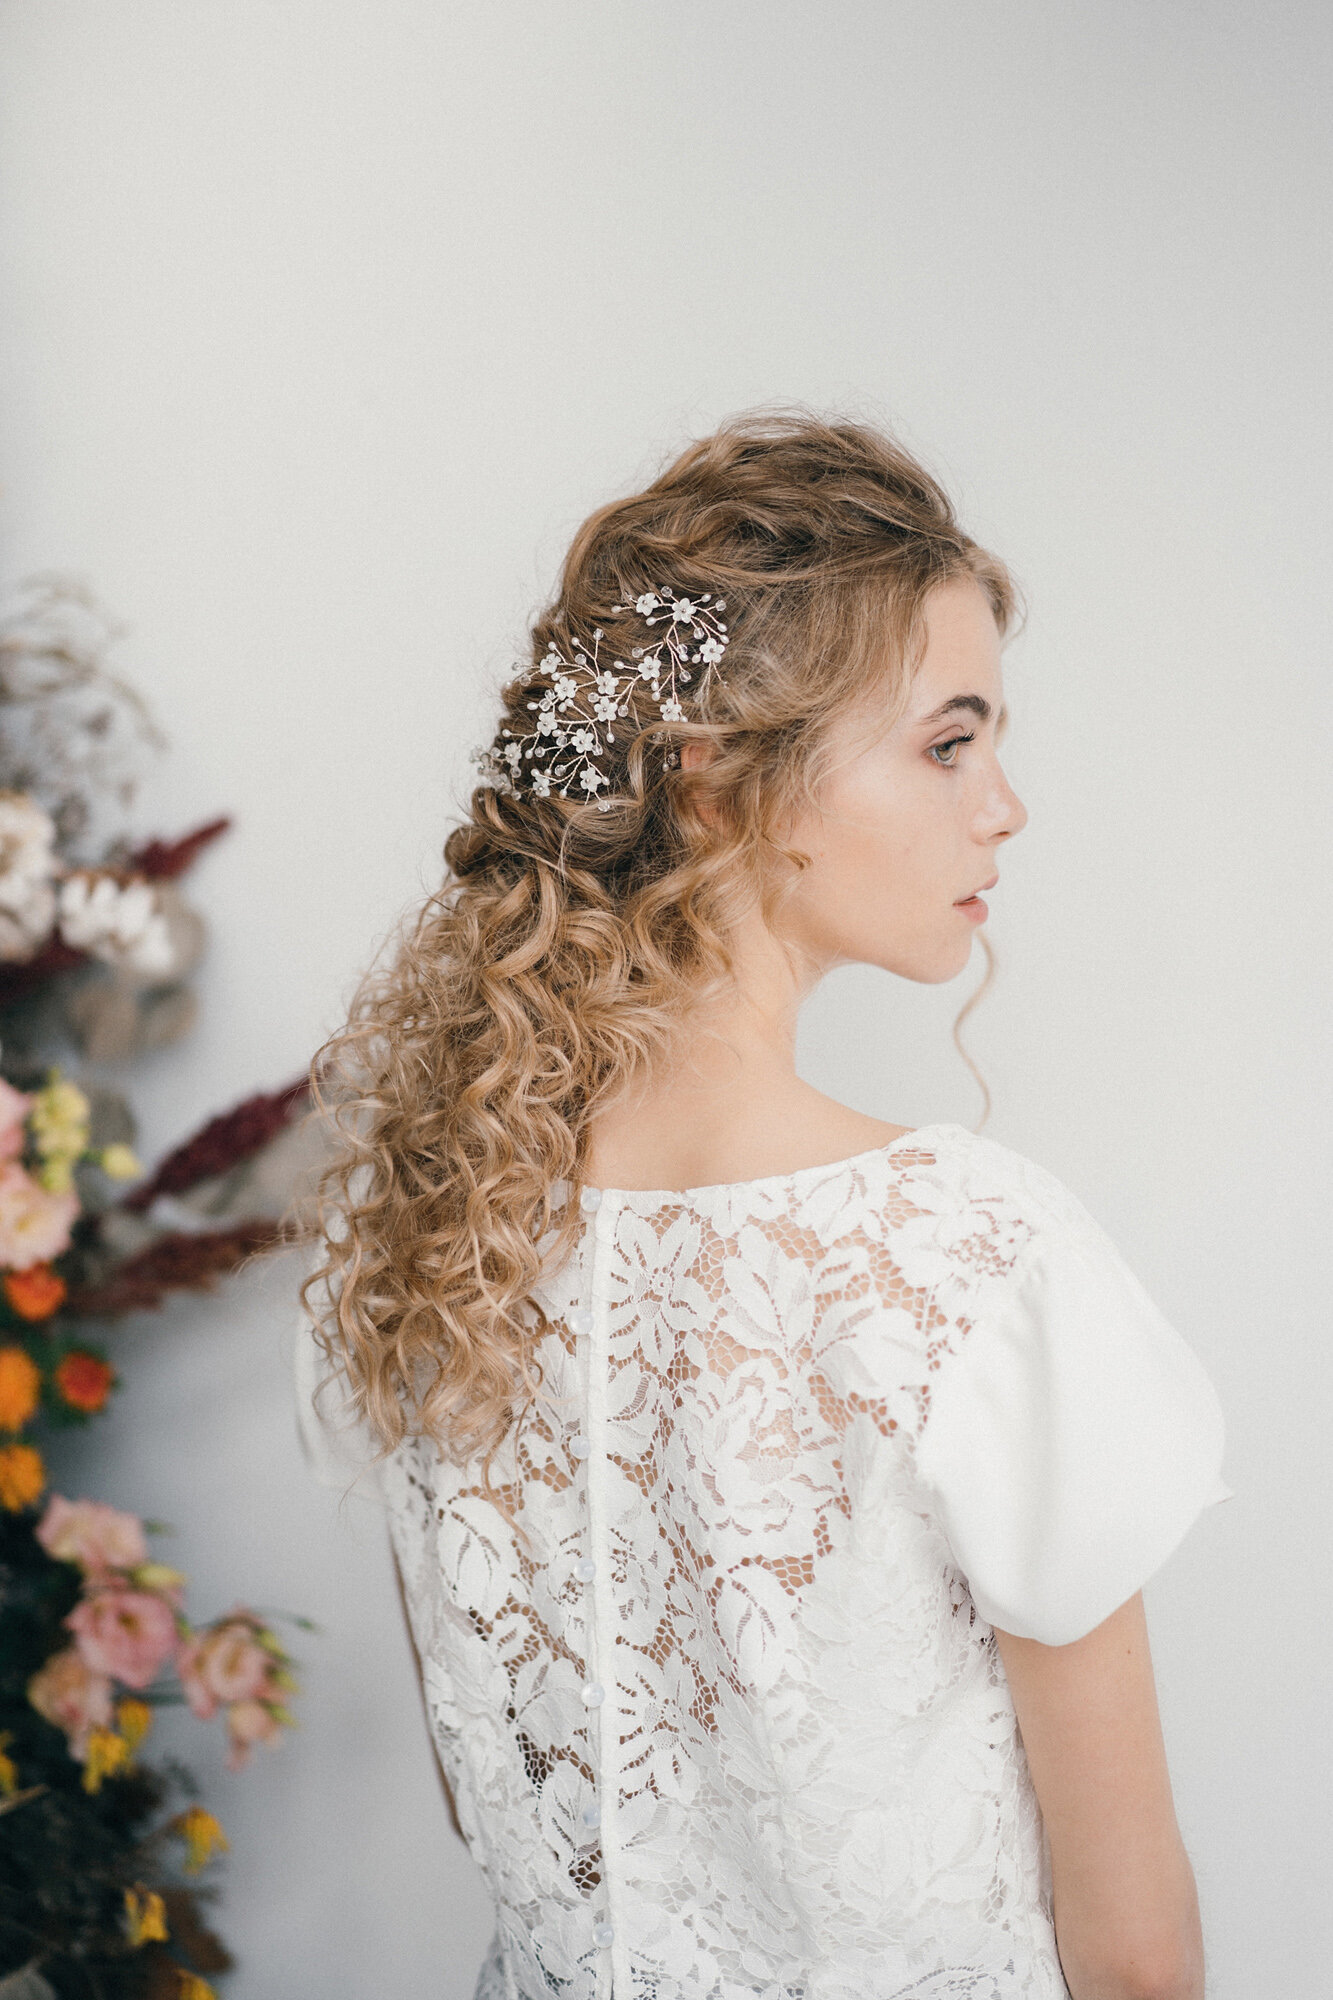 Debbie-Carlisle-Bridal-Accessories-Kate-Beaumont-Wedding-Gowns-Sheffield-Yorkshire-UK-32.jpg